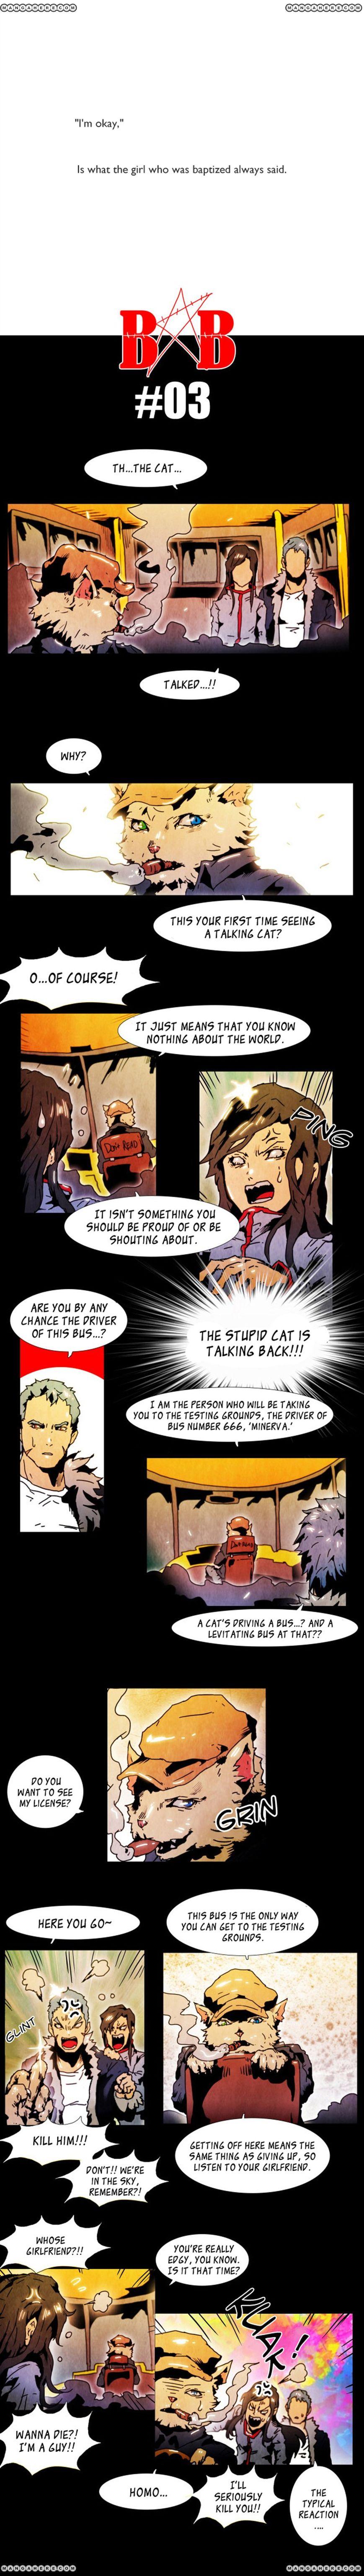 Black Behemoth 3 Page 1